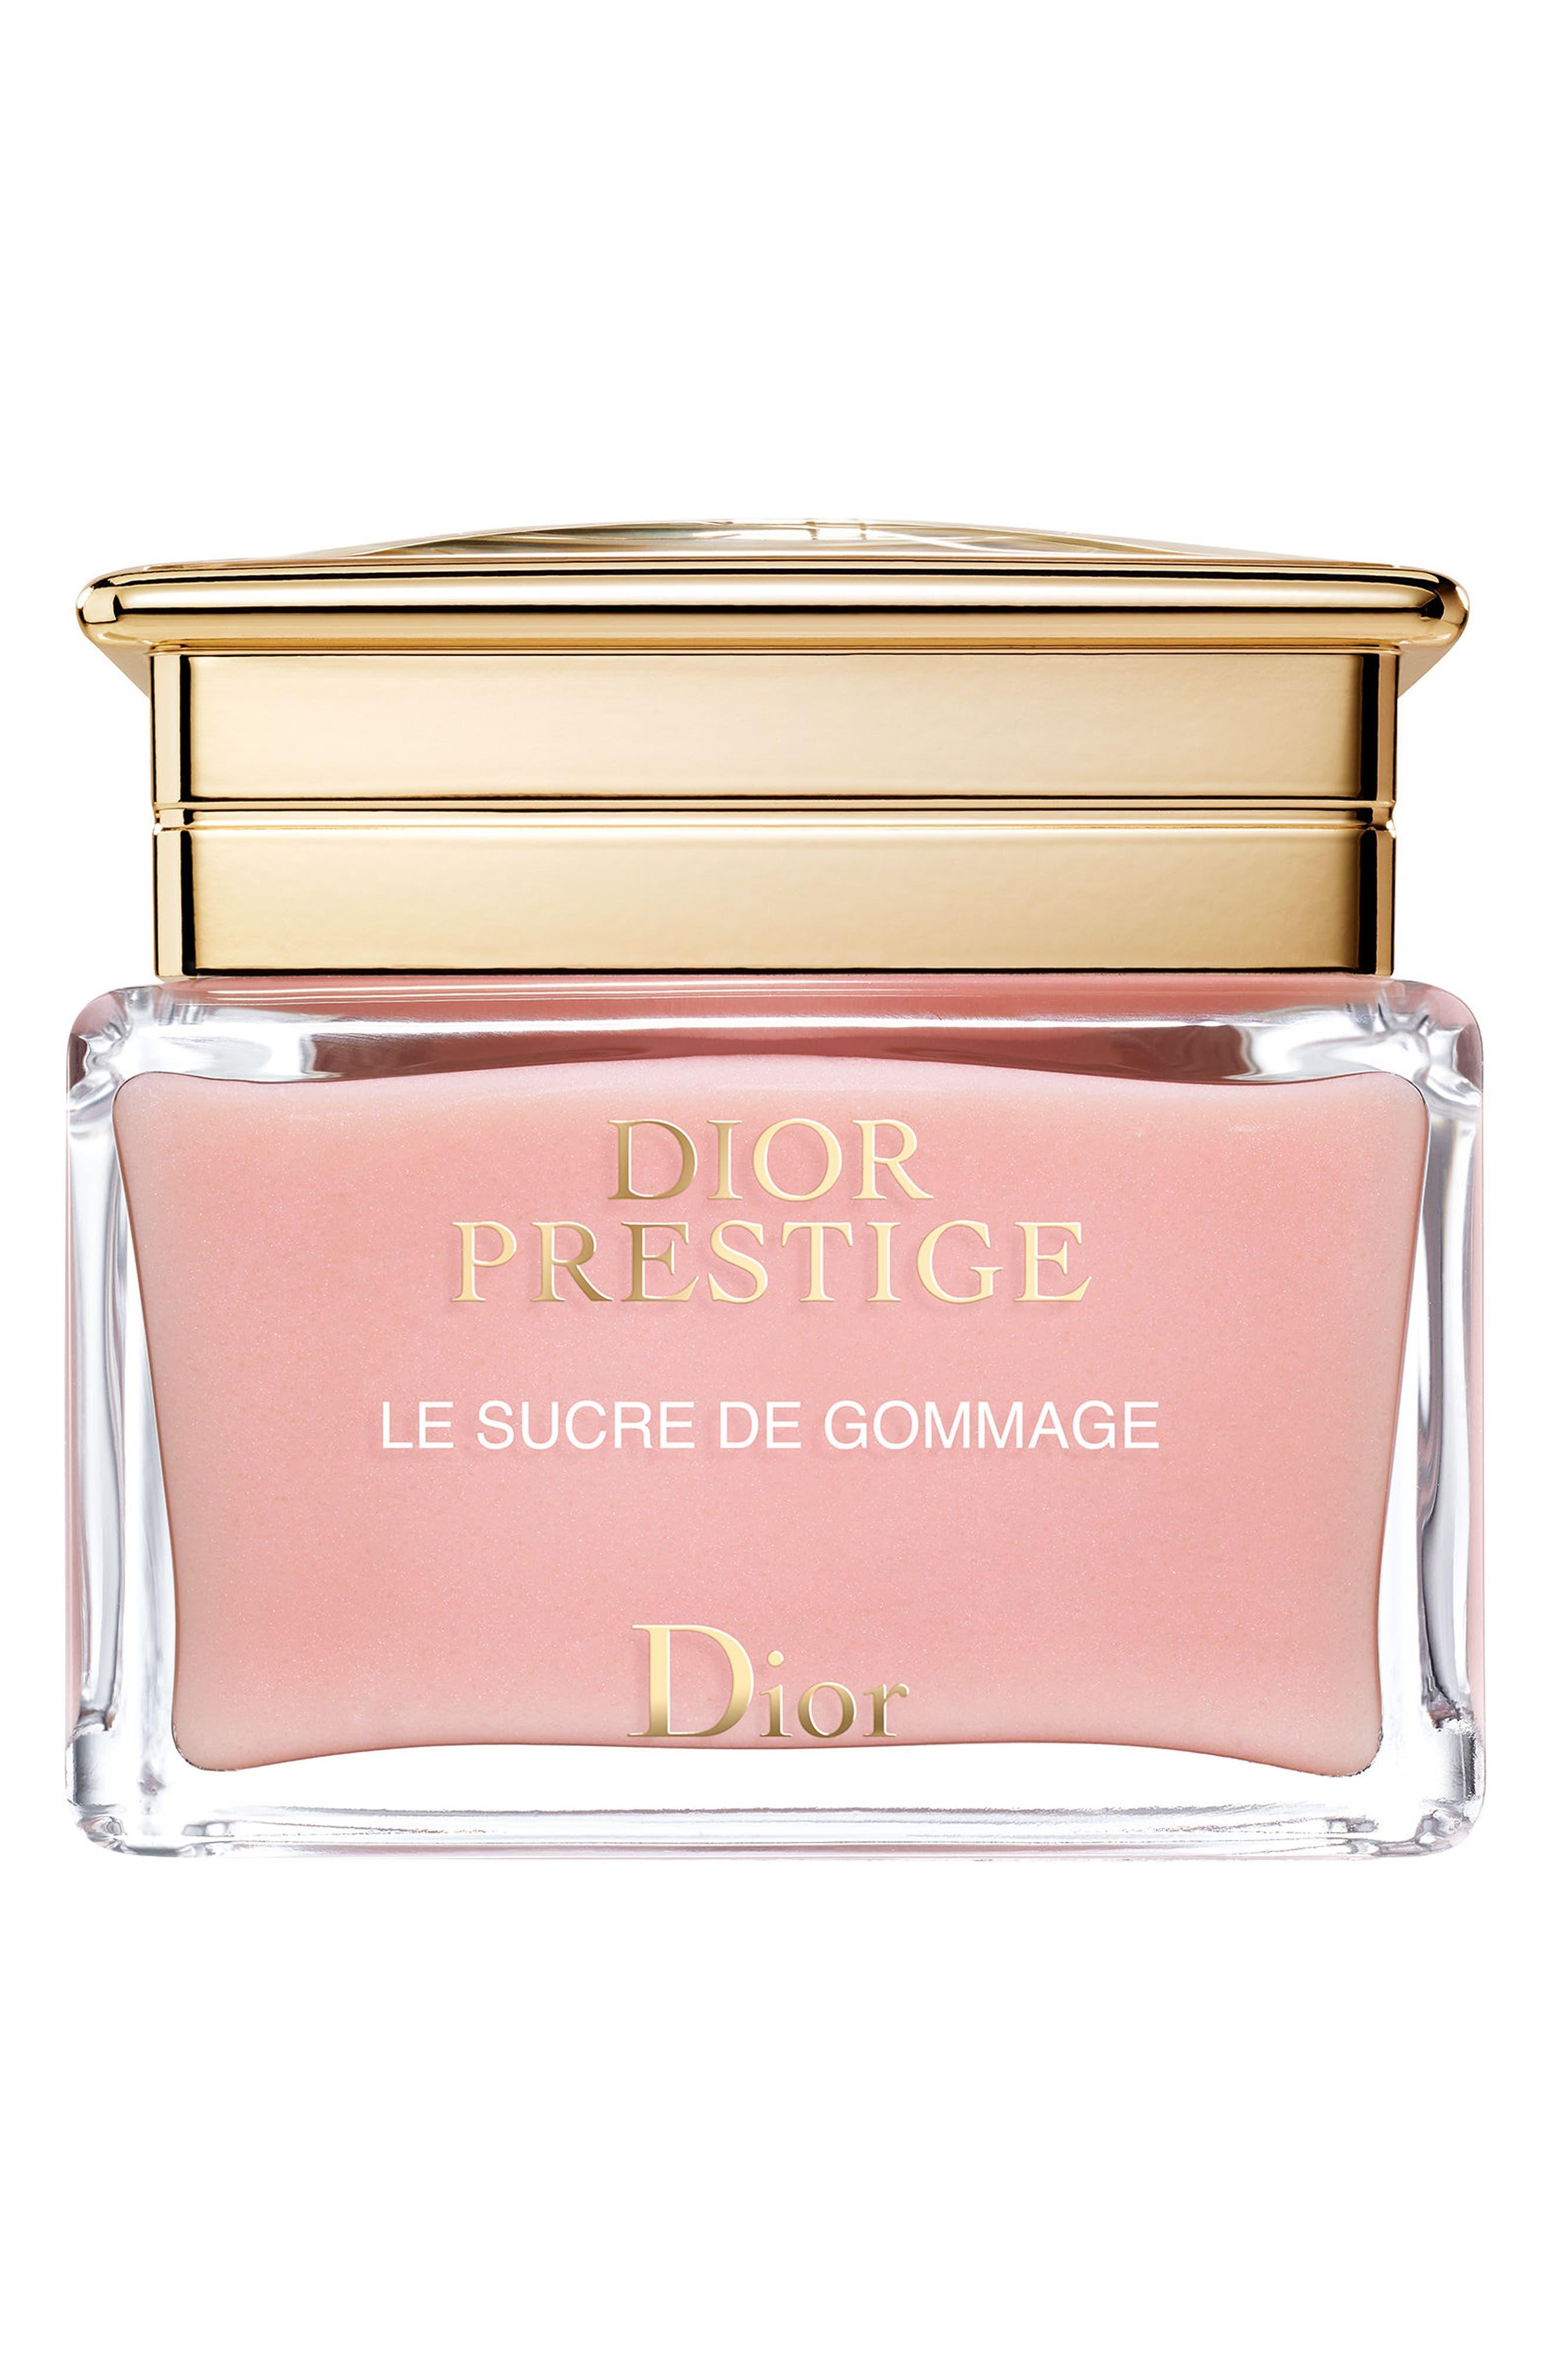 Dior Le Sucre de Gommage Rose Sugar Scrub